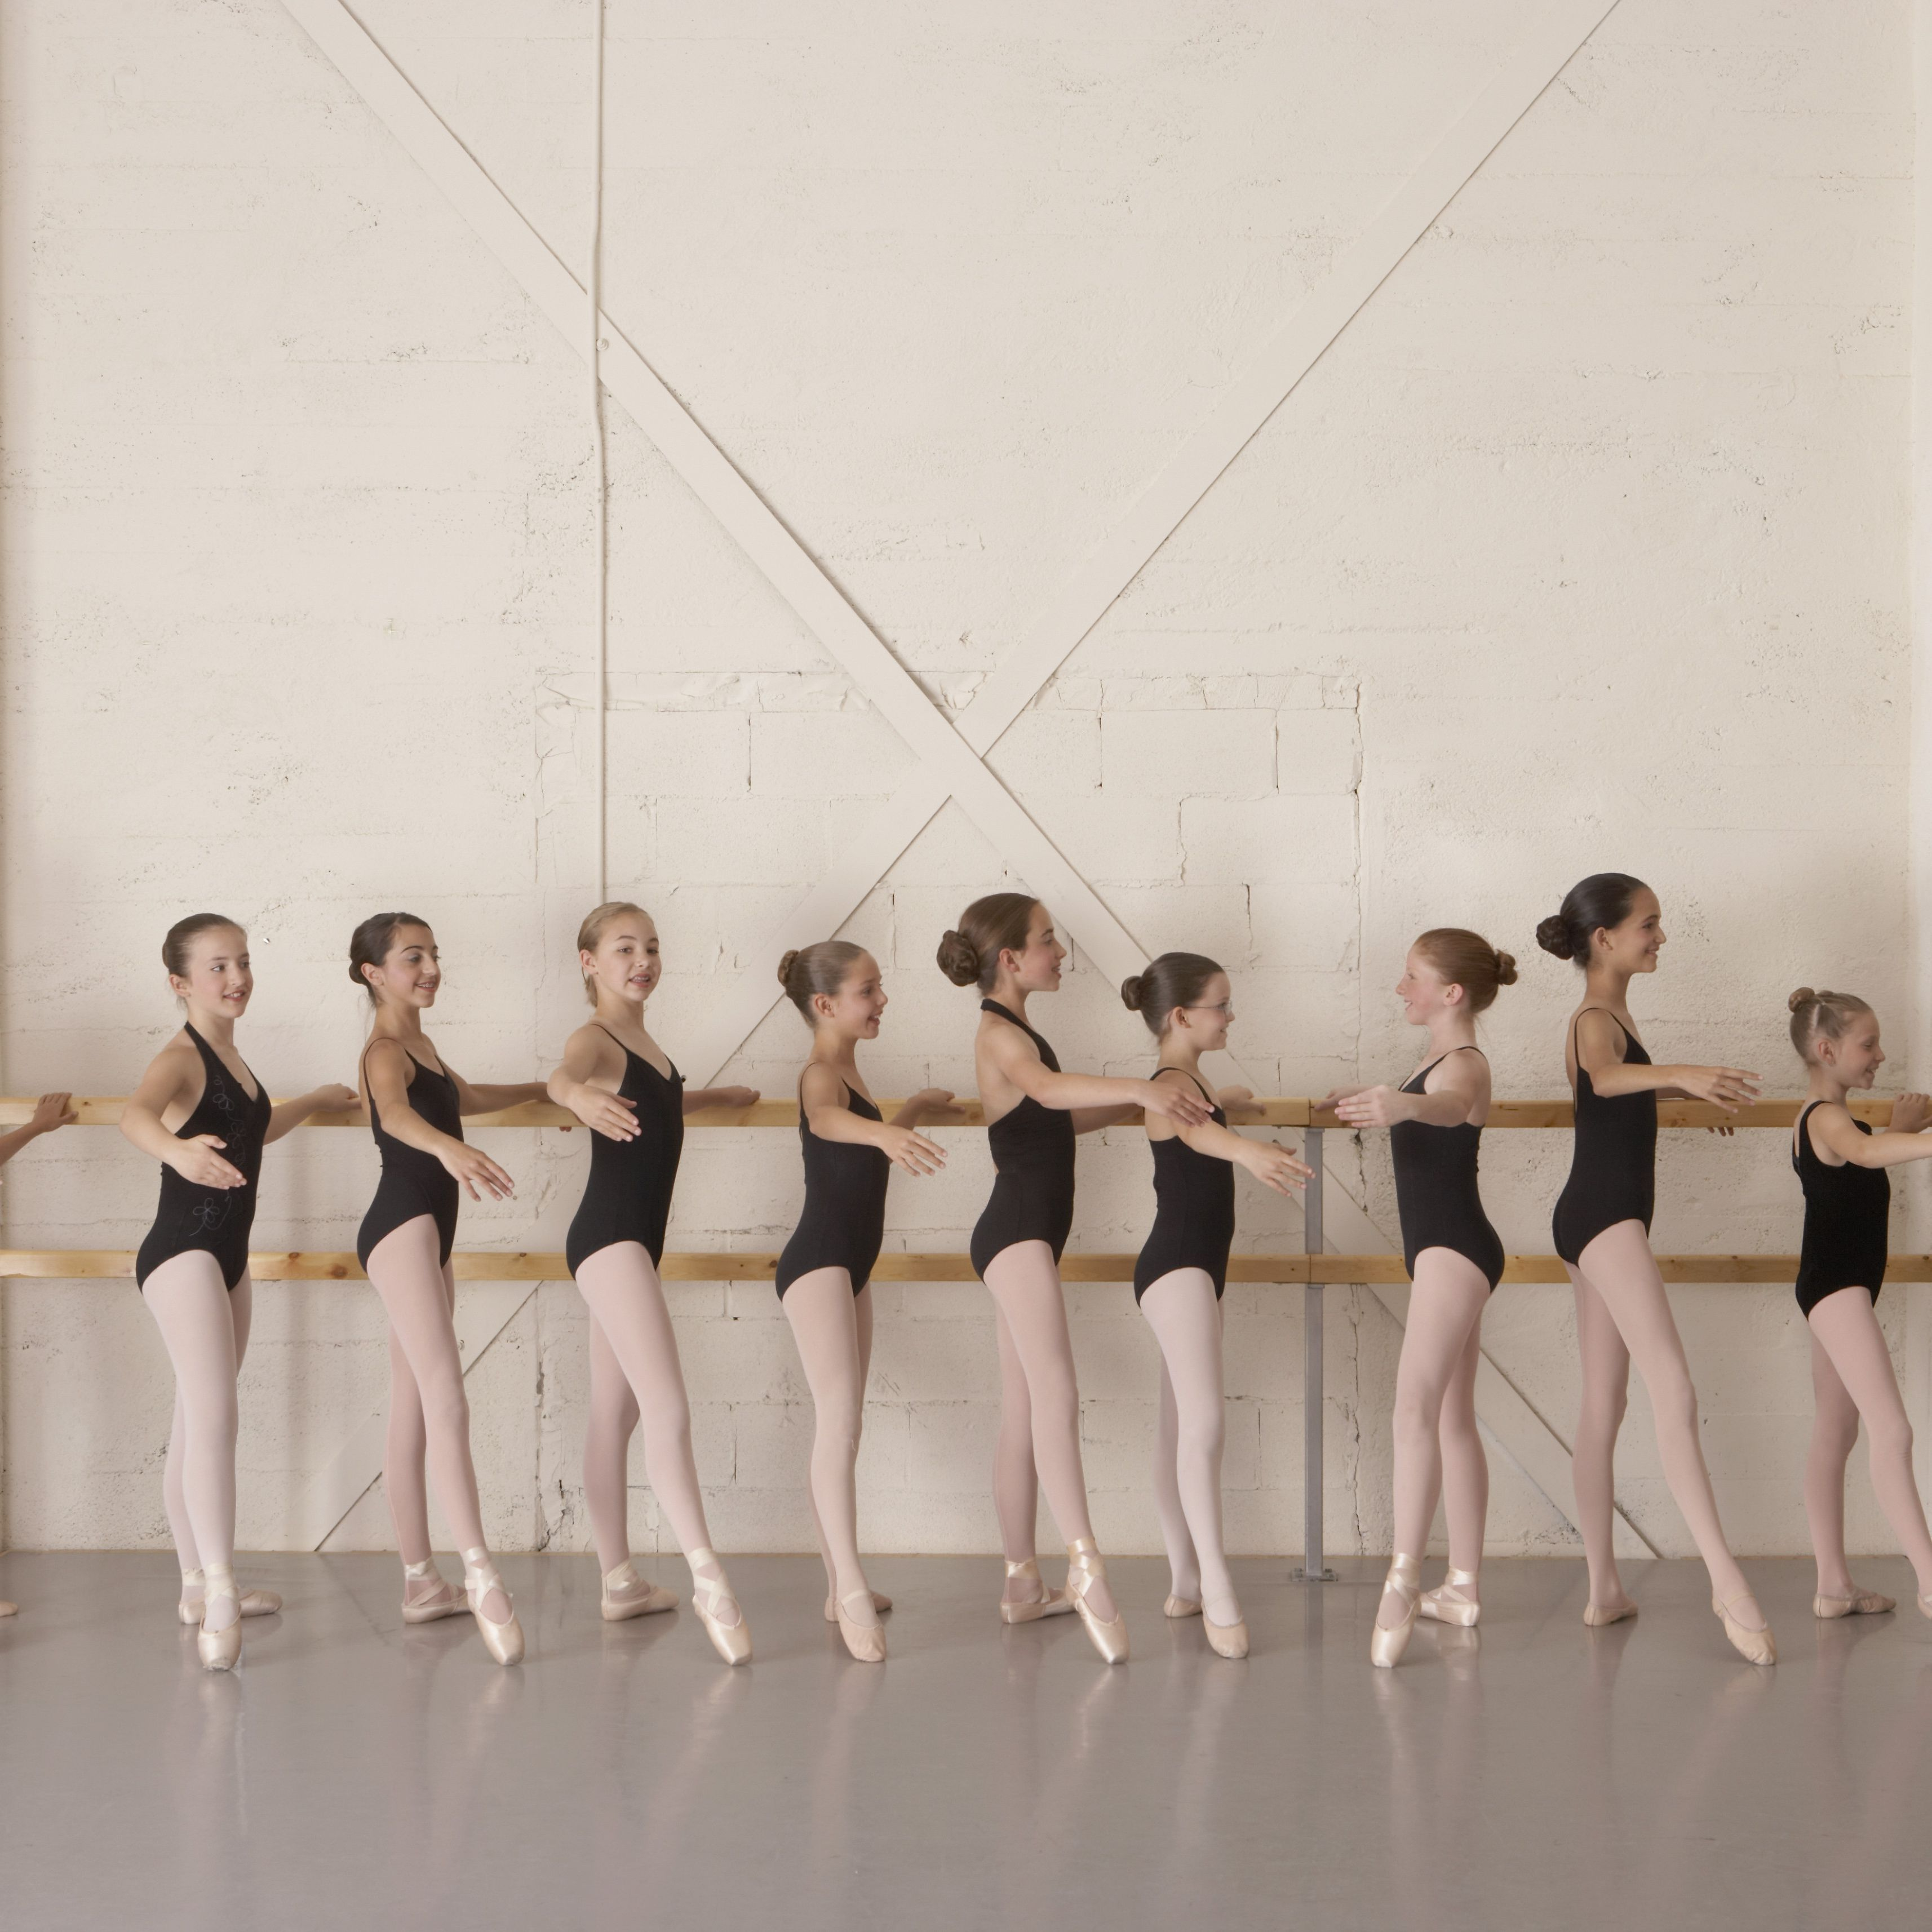 Kids Boys Satin Finish Ballet Shirt Long Sleeves Dance Costume Dancewear Show